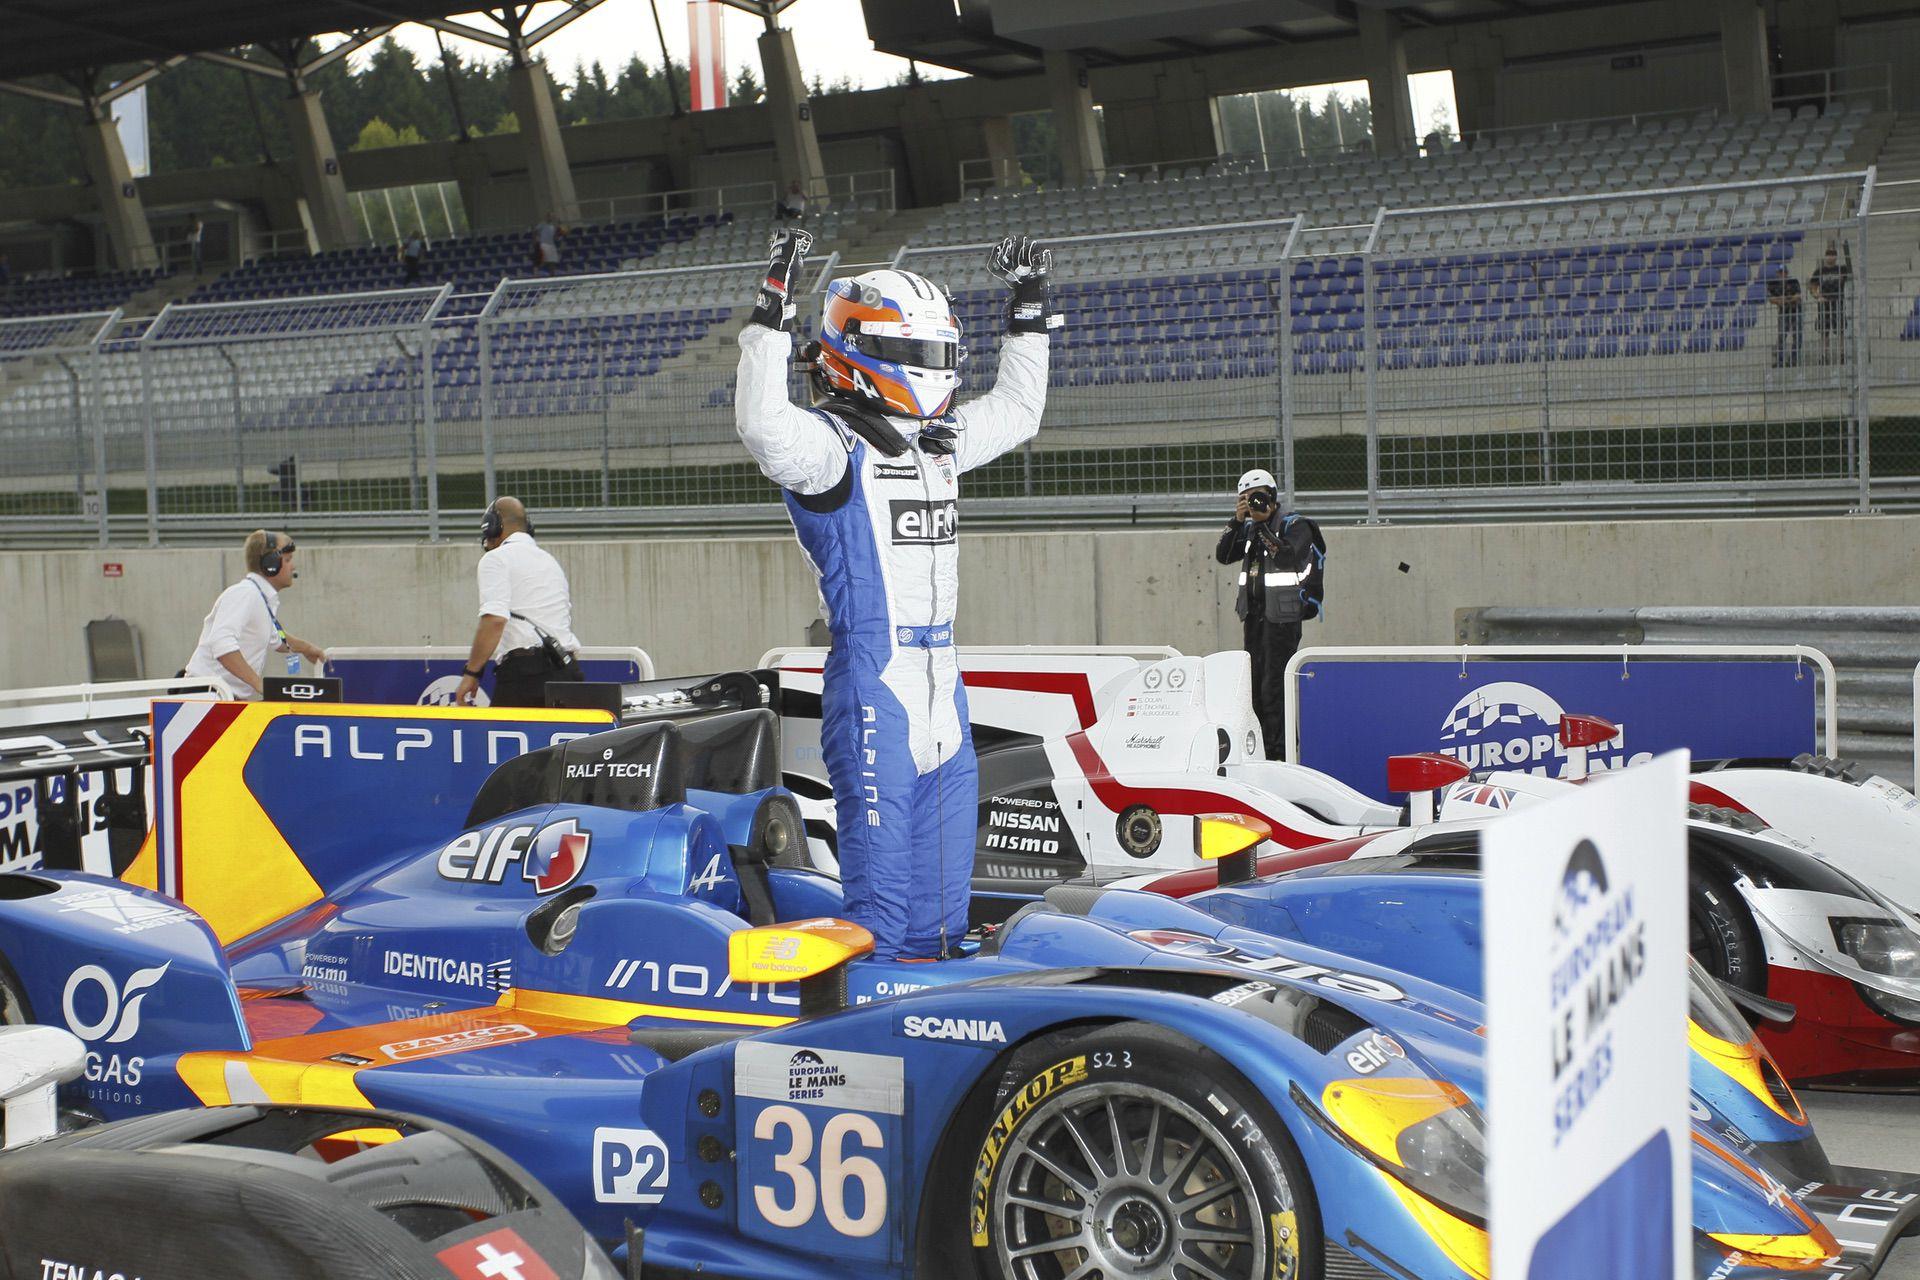 21-2021-Alpine-Story-Circuit